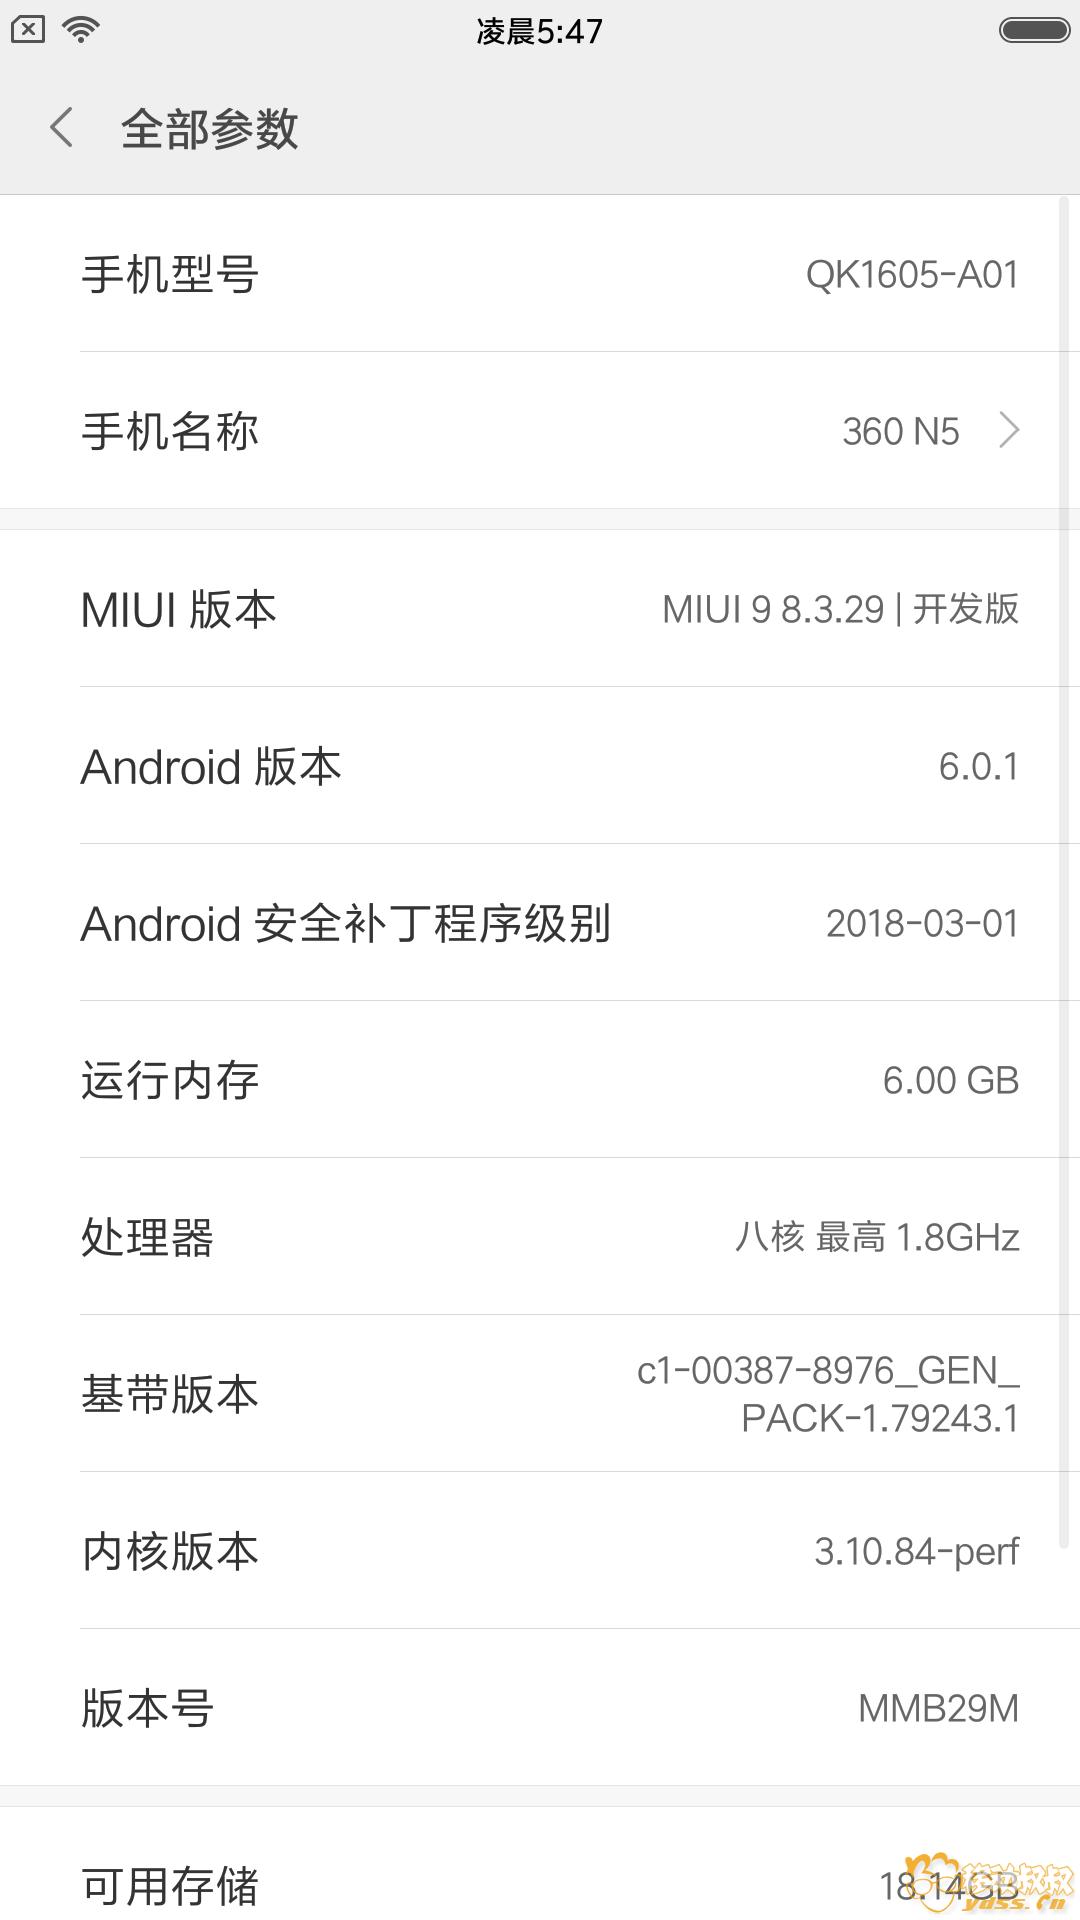 Screenshot_2018-04-05-05-47-51-838_com.android.settings.png